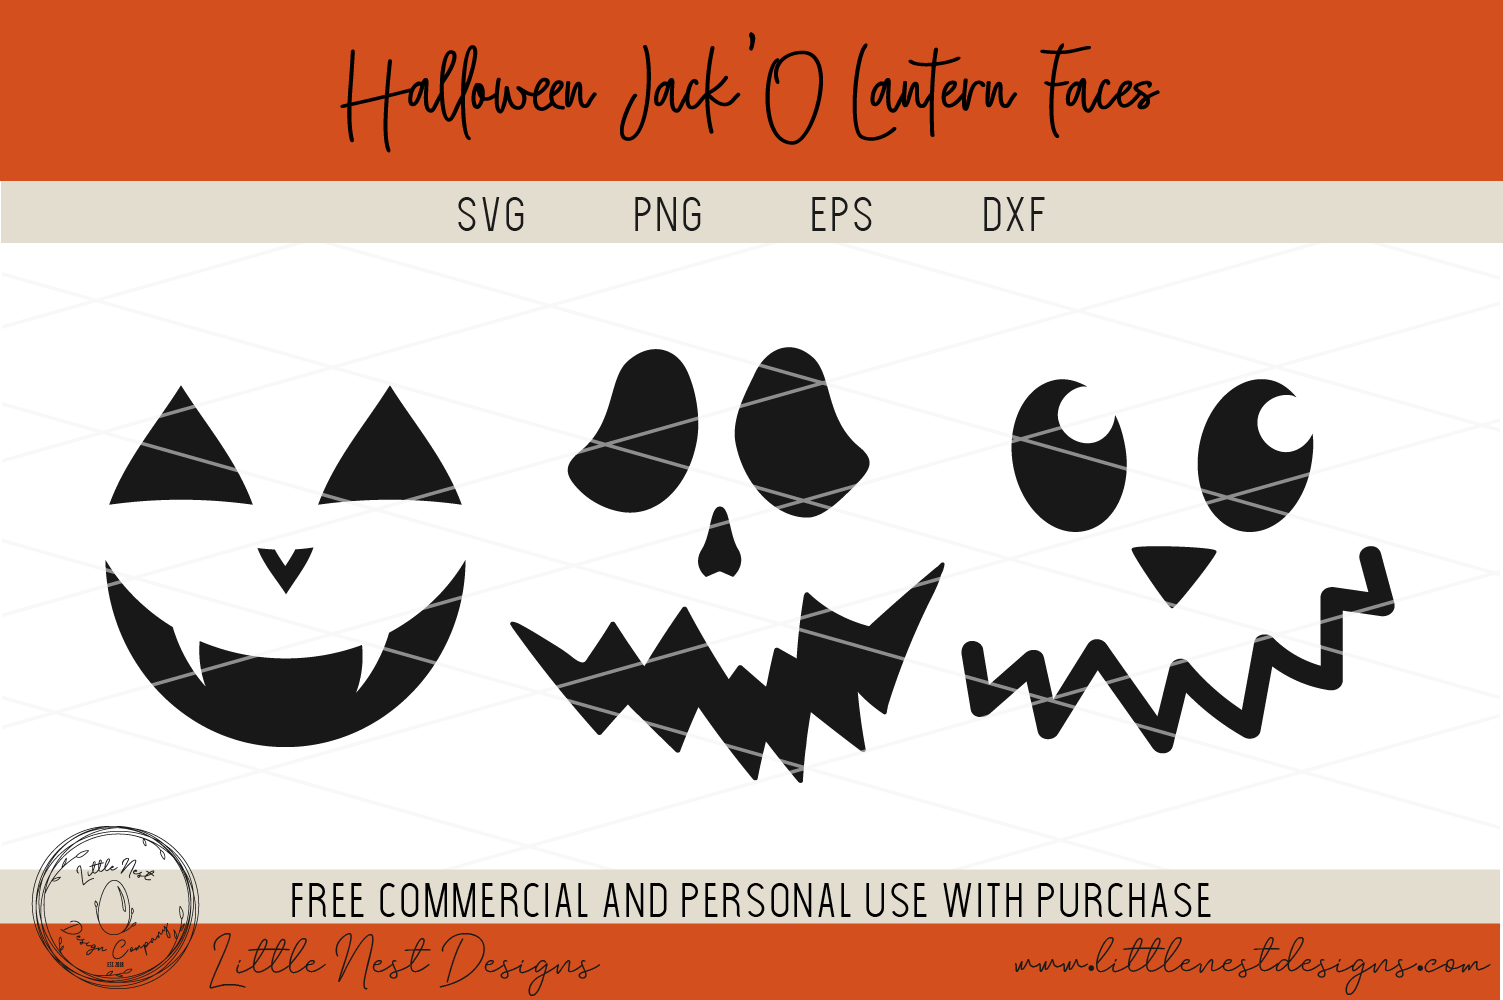 Halloween Jack O Lantern Faces - Pumpkin Faces - SVG Pumpkin example image 2